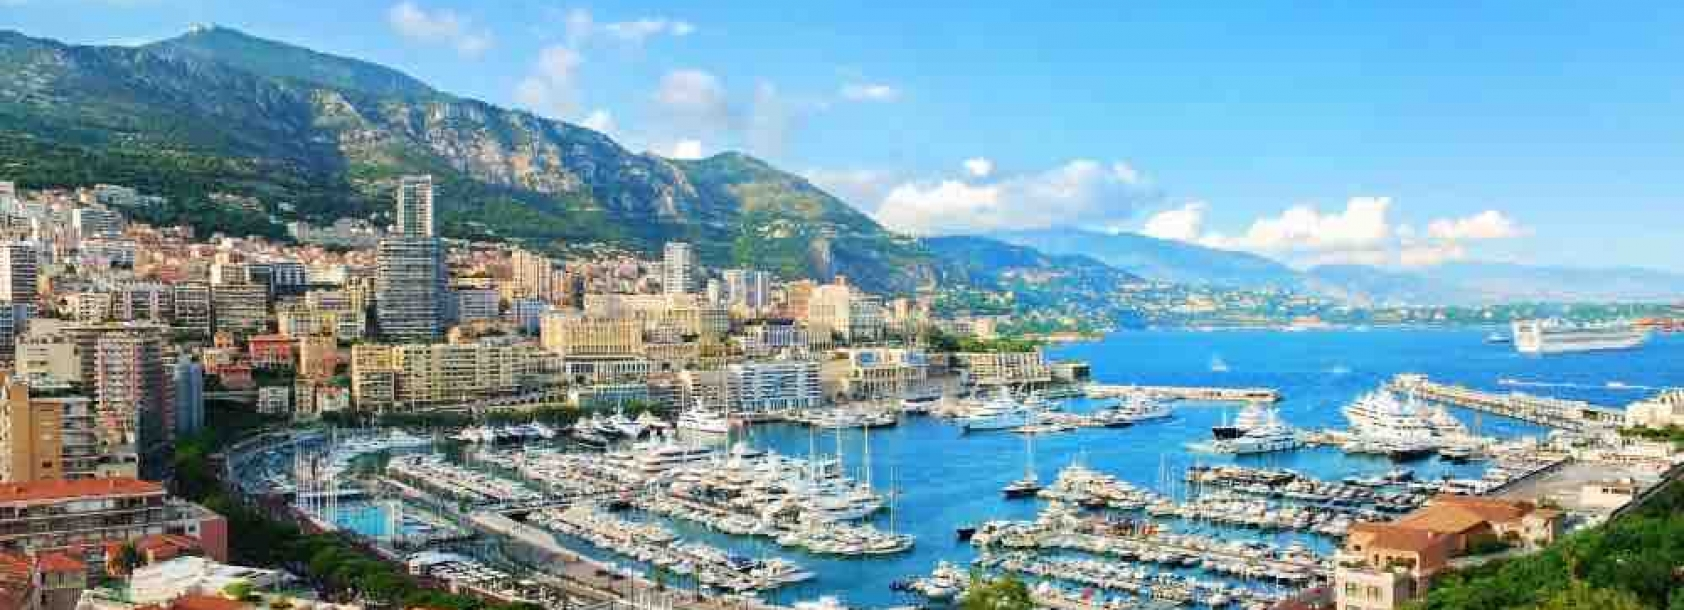 Monaco_Monte Carlo